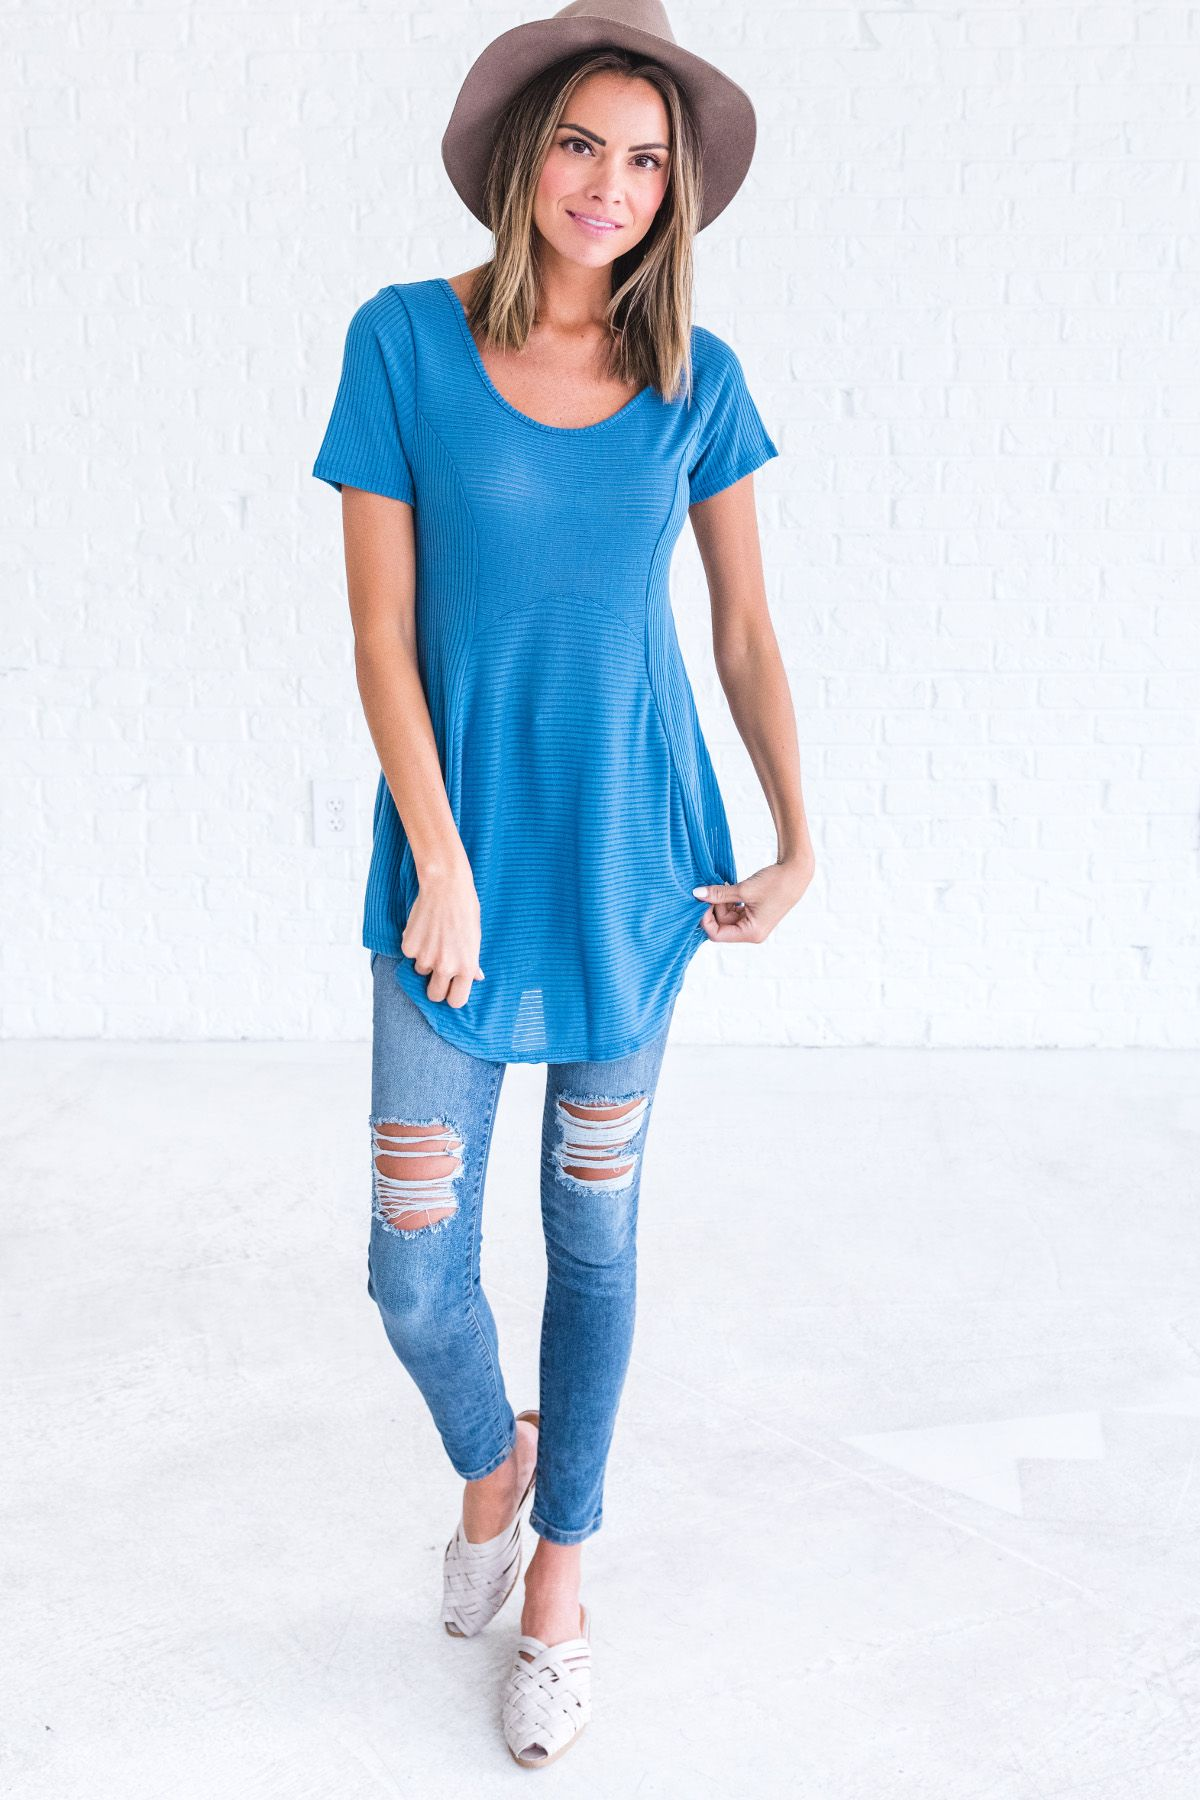 Find Yourself Blue Ribbed Top - Bella Ella Boutique Online  2be01166e901